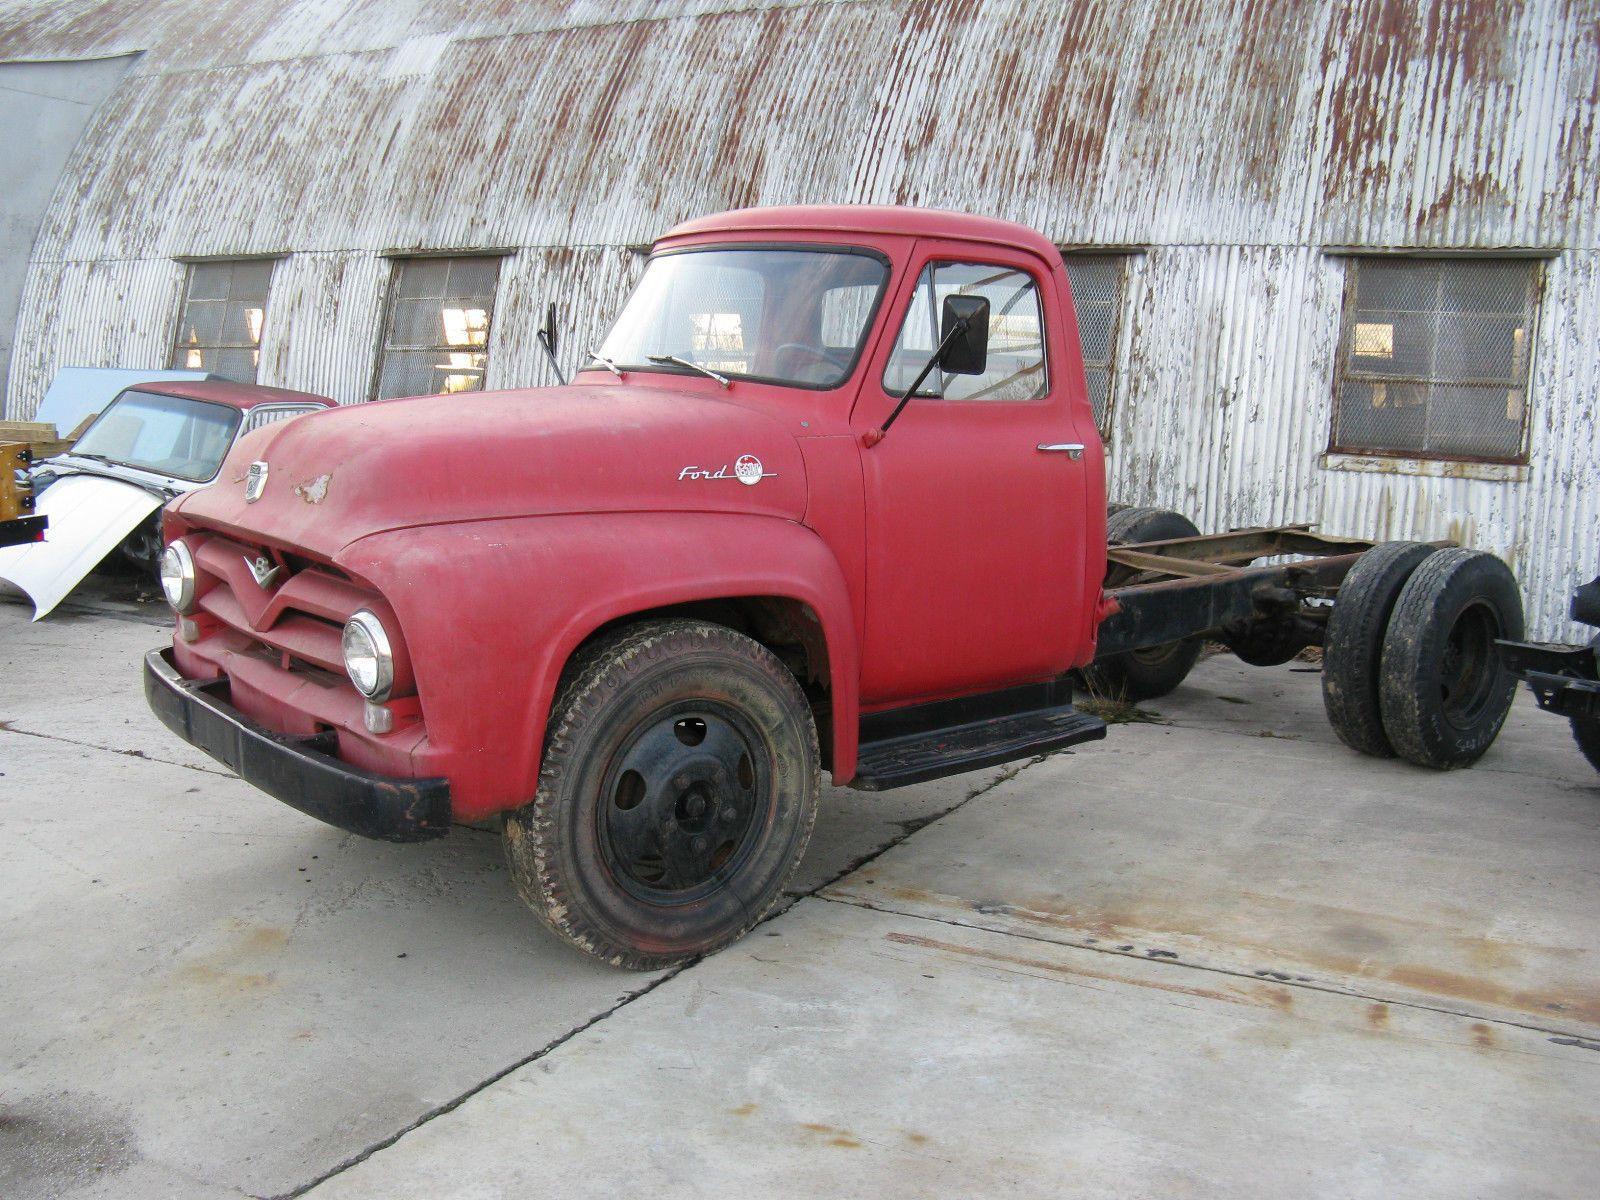 1955 Ford F500 Truck | eBay | Cars, Trucks and Bikes | Pinterest ...